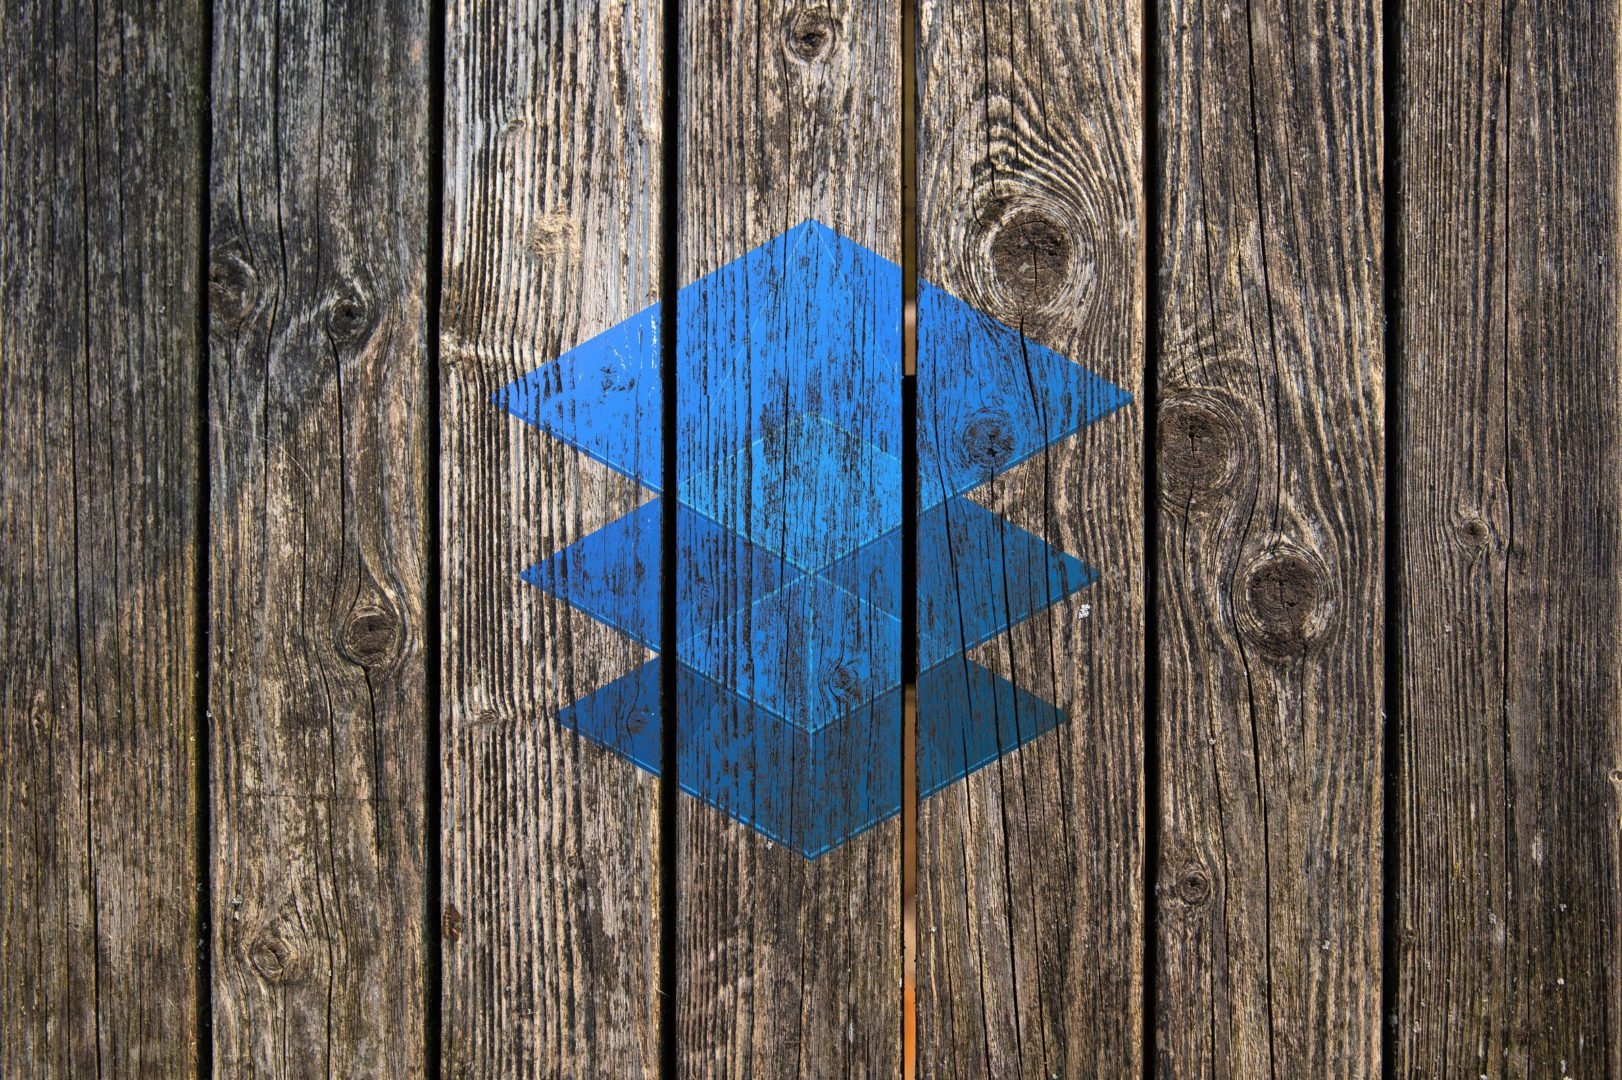 Imerge Pro logo blended on wooden plank background (Blend-If blending mode)